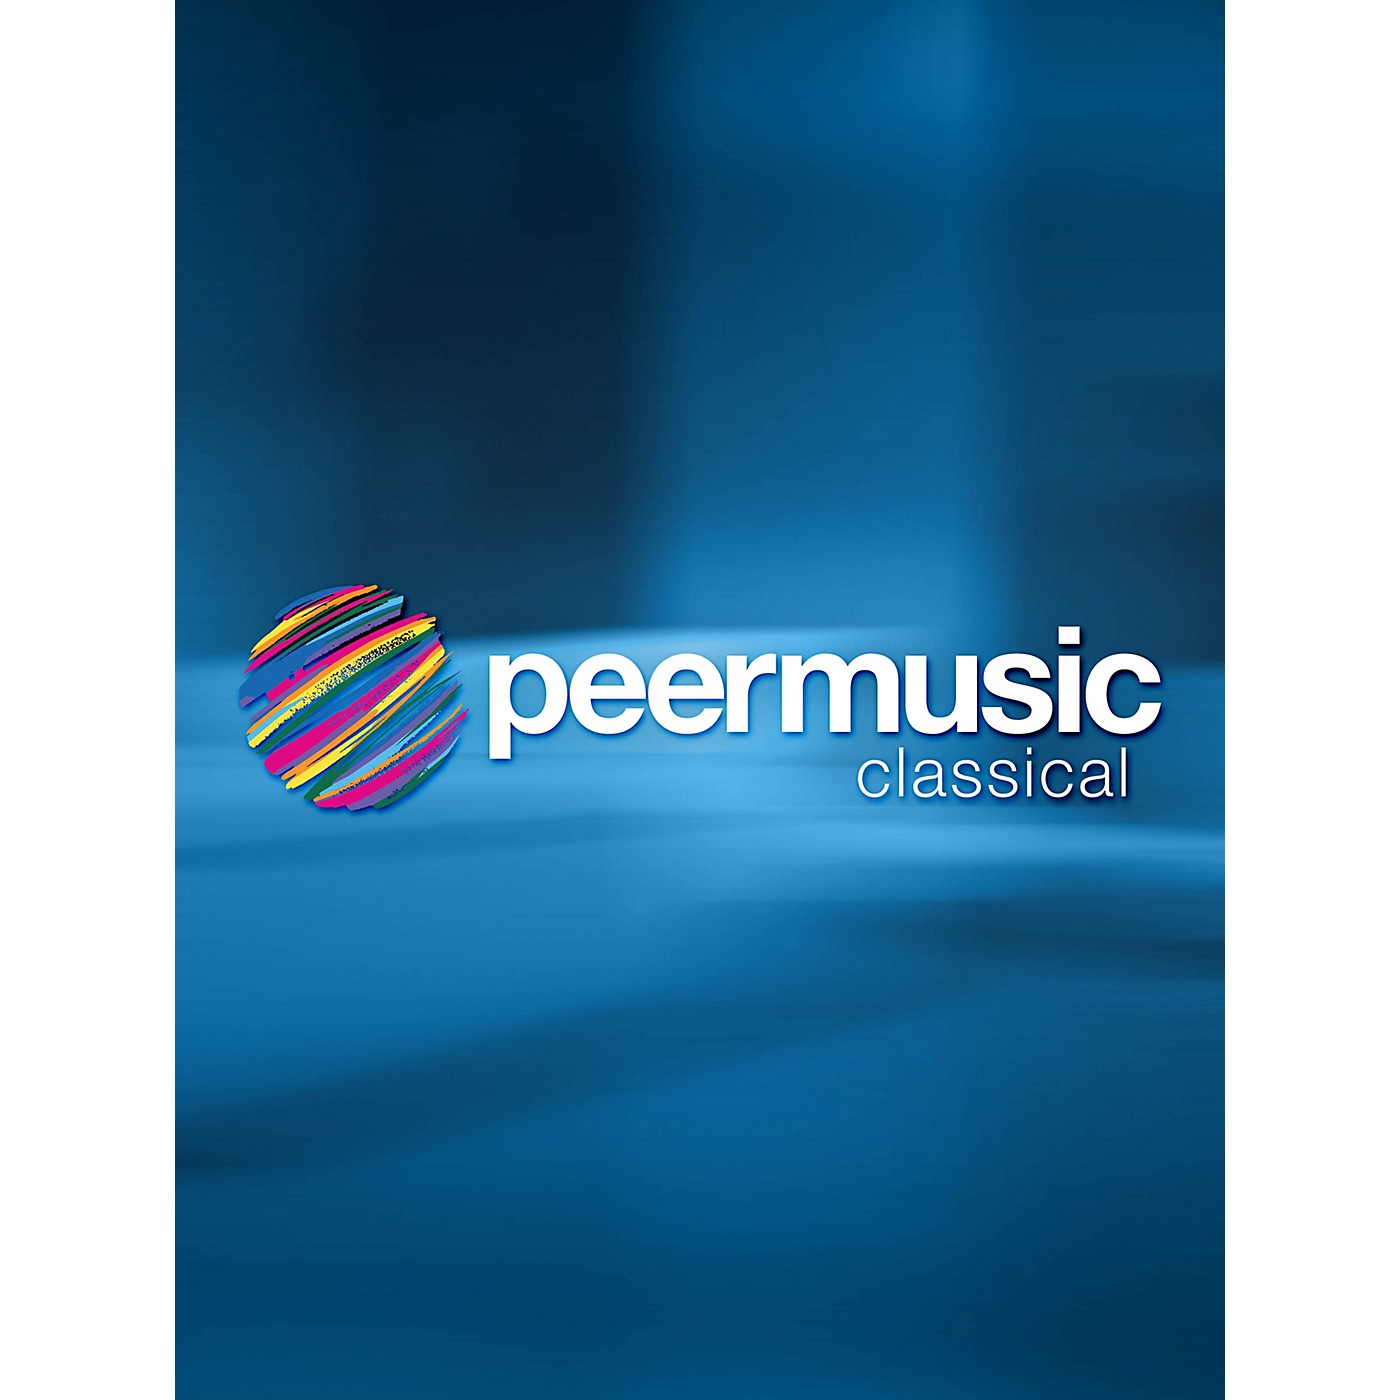 Peer Music Flute Concerto No.2 (Flute & Orchestra Score) Peermusic Classical Series thumbnail